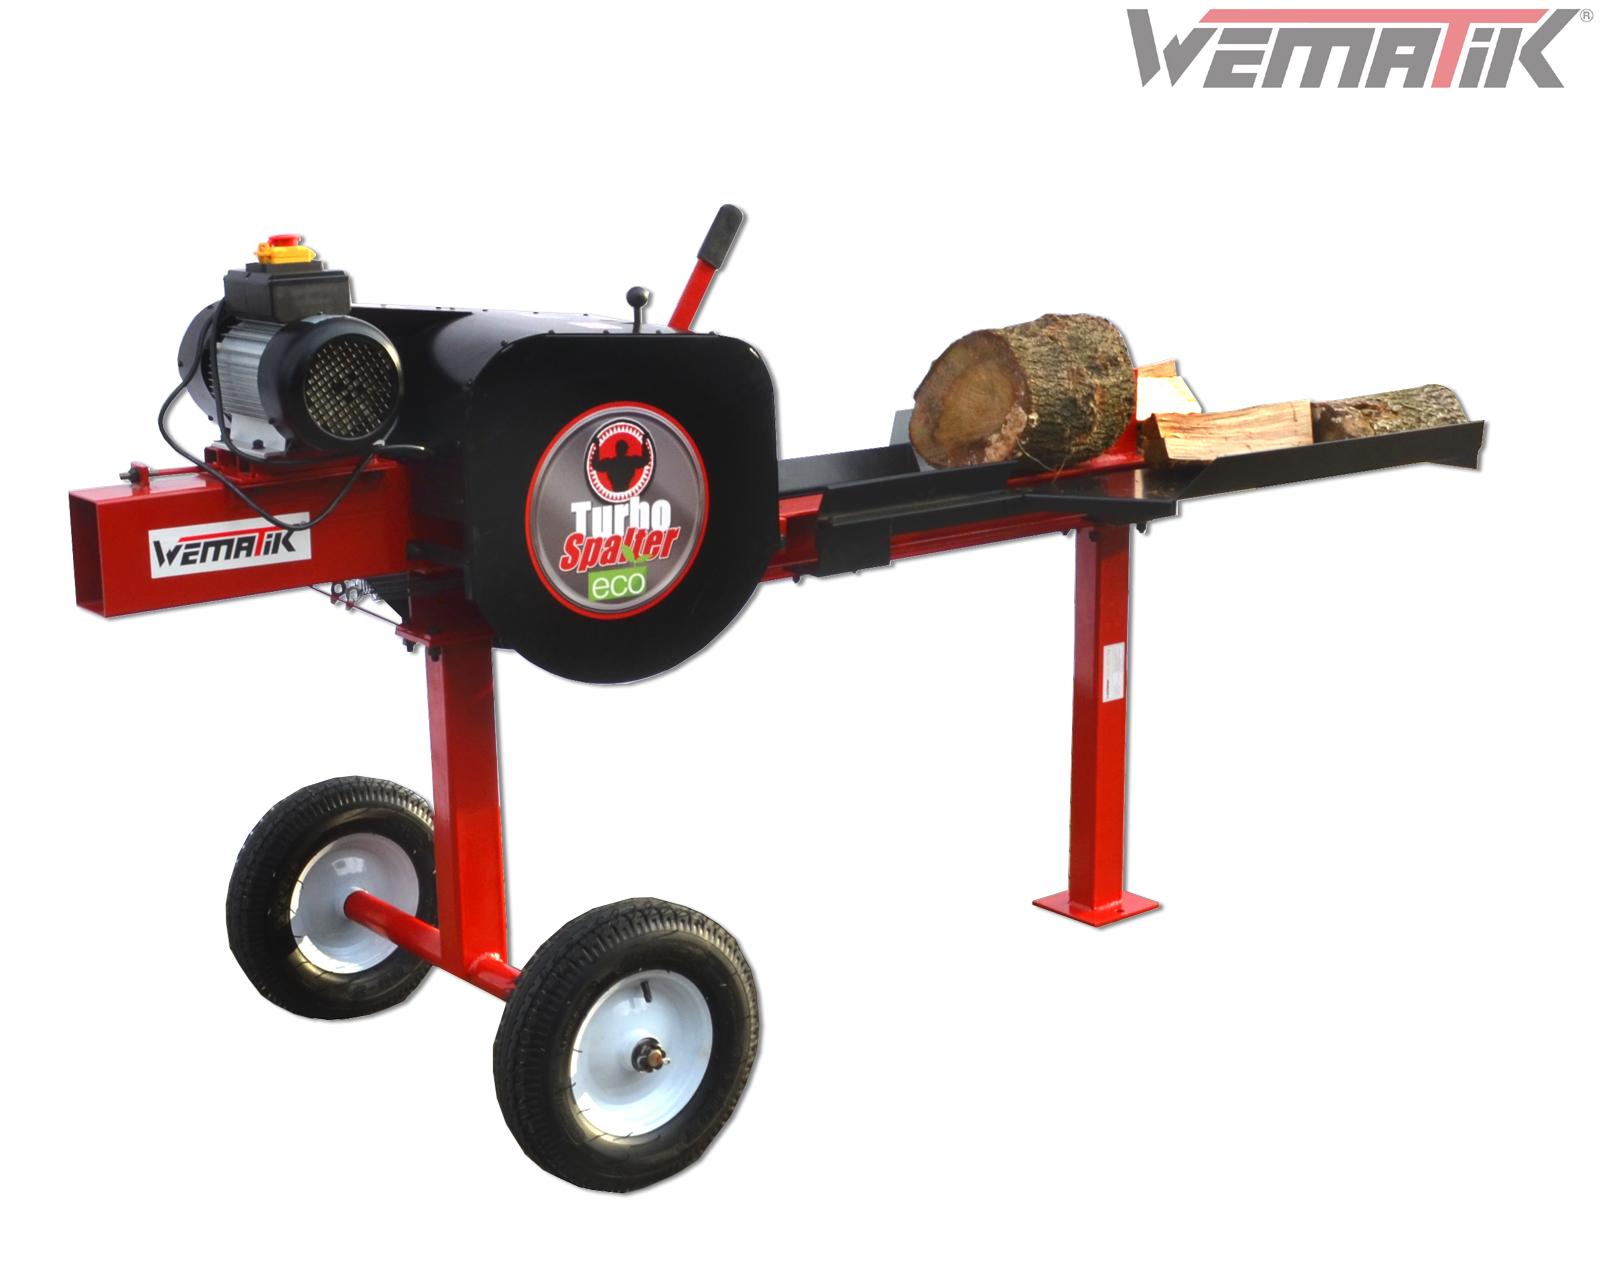 Beliebt Bevorzugt Turbo Splitter Eco 25t turbospalter Wood Splitter schnellspalter @CF_81